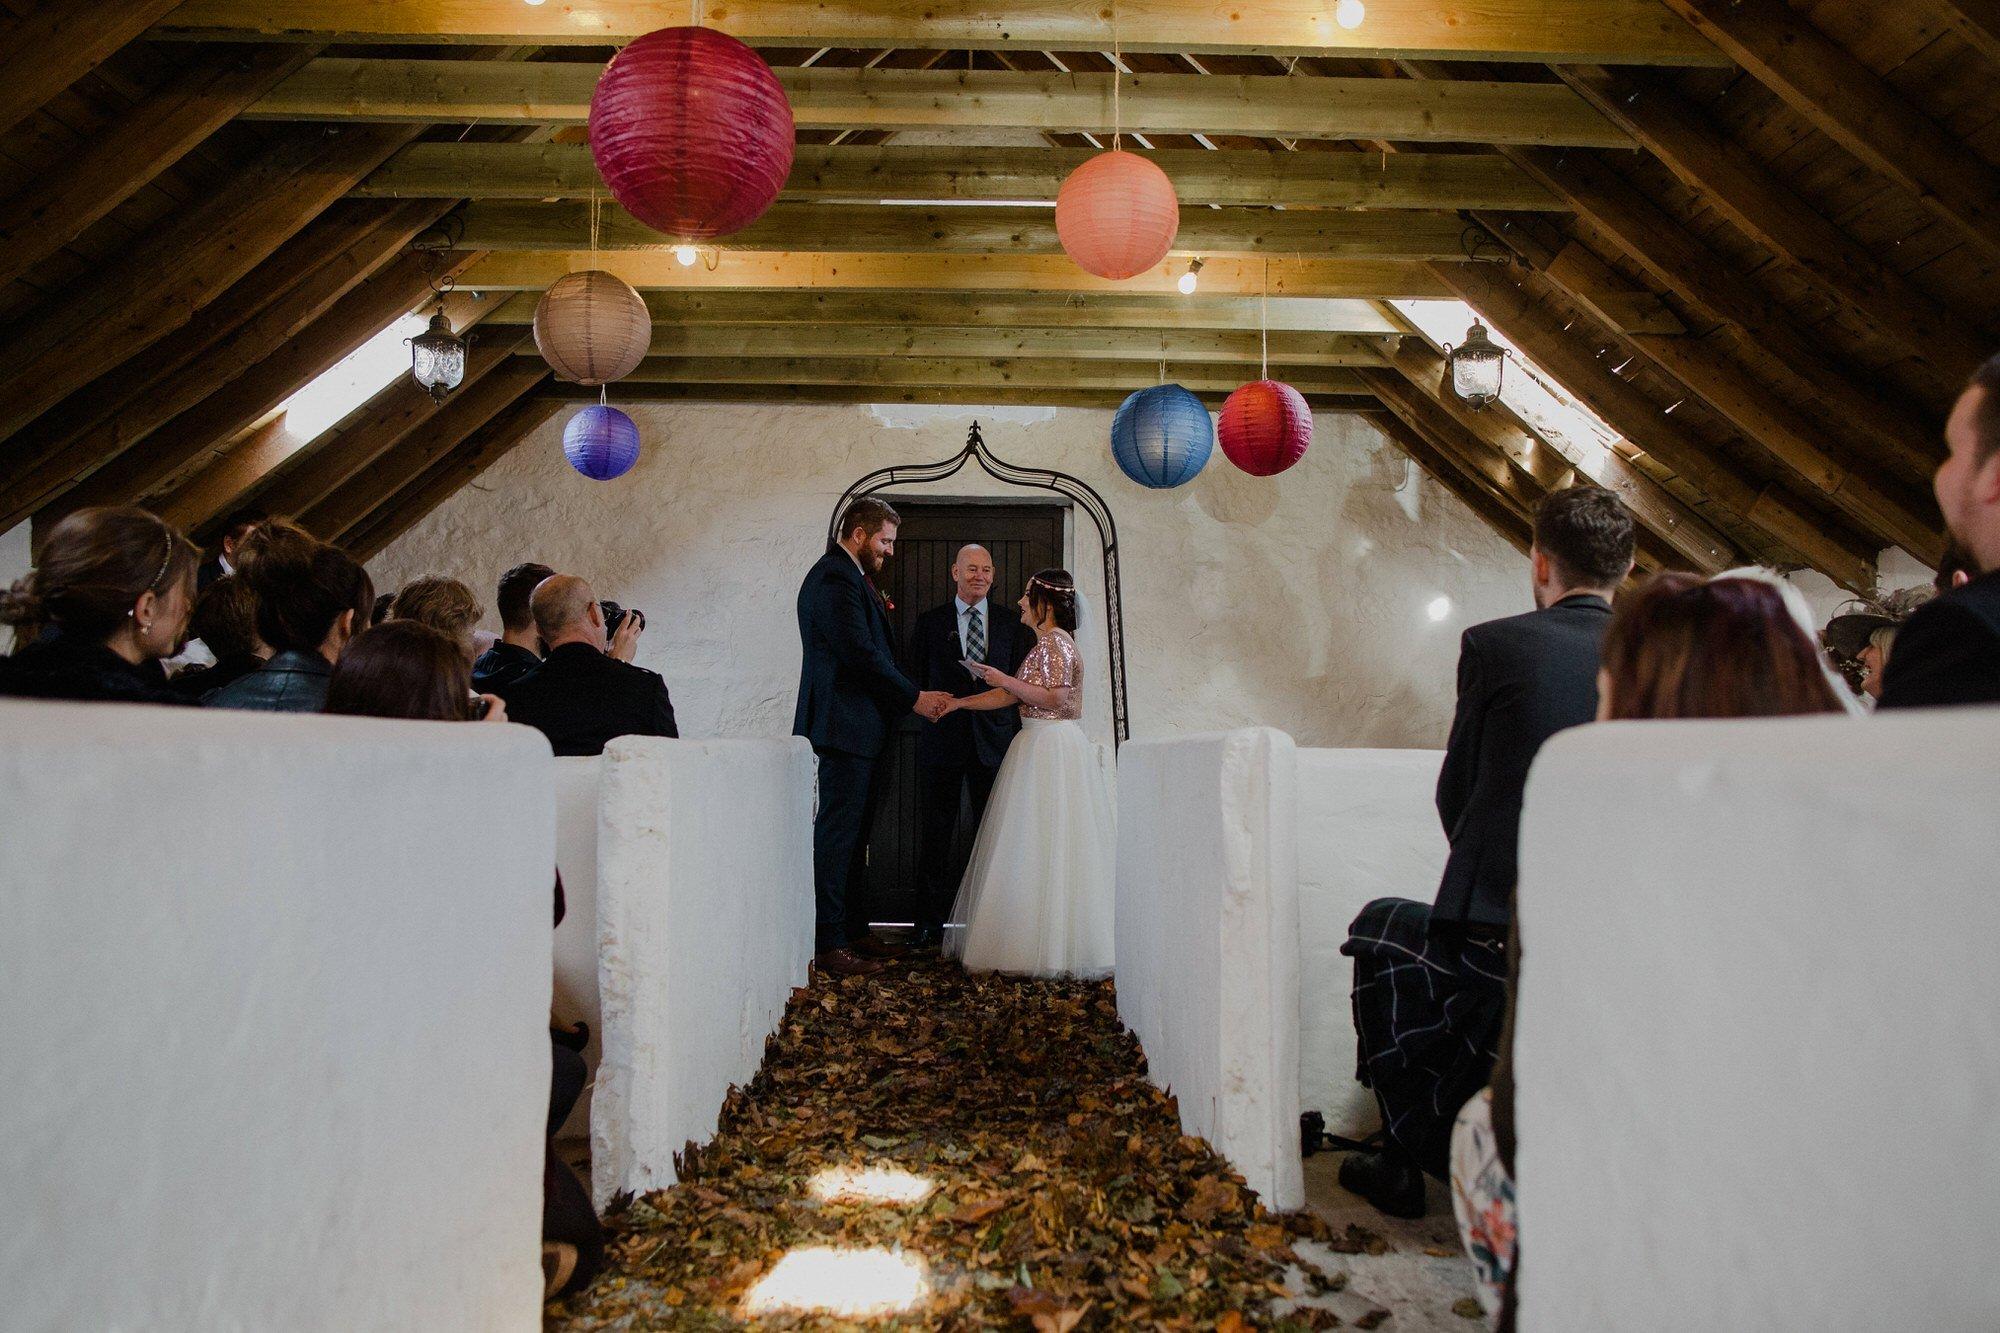 026 TIN SHED KNOCKRAICH FARM WEDDING ALTERNATIVE BRIDE ZOE ALEXANDRA PHOTOGRAPHY